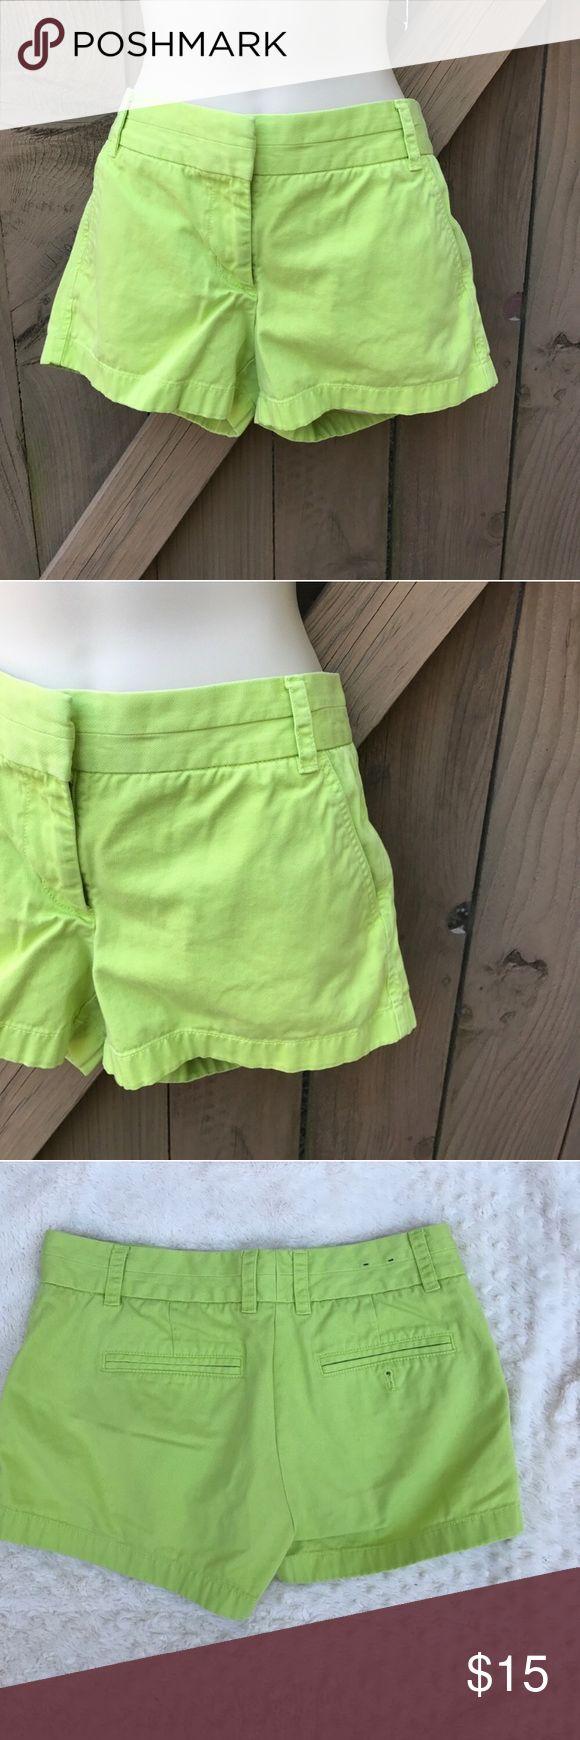 J. Crew size 4 neon green chino shorts Size 4 neon green J. Crew chino shorts: BIN 1 J. Crew Shorts